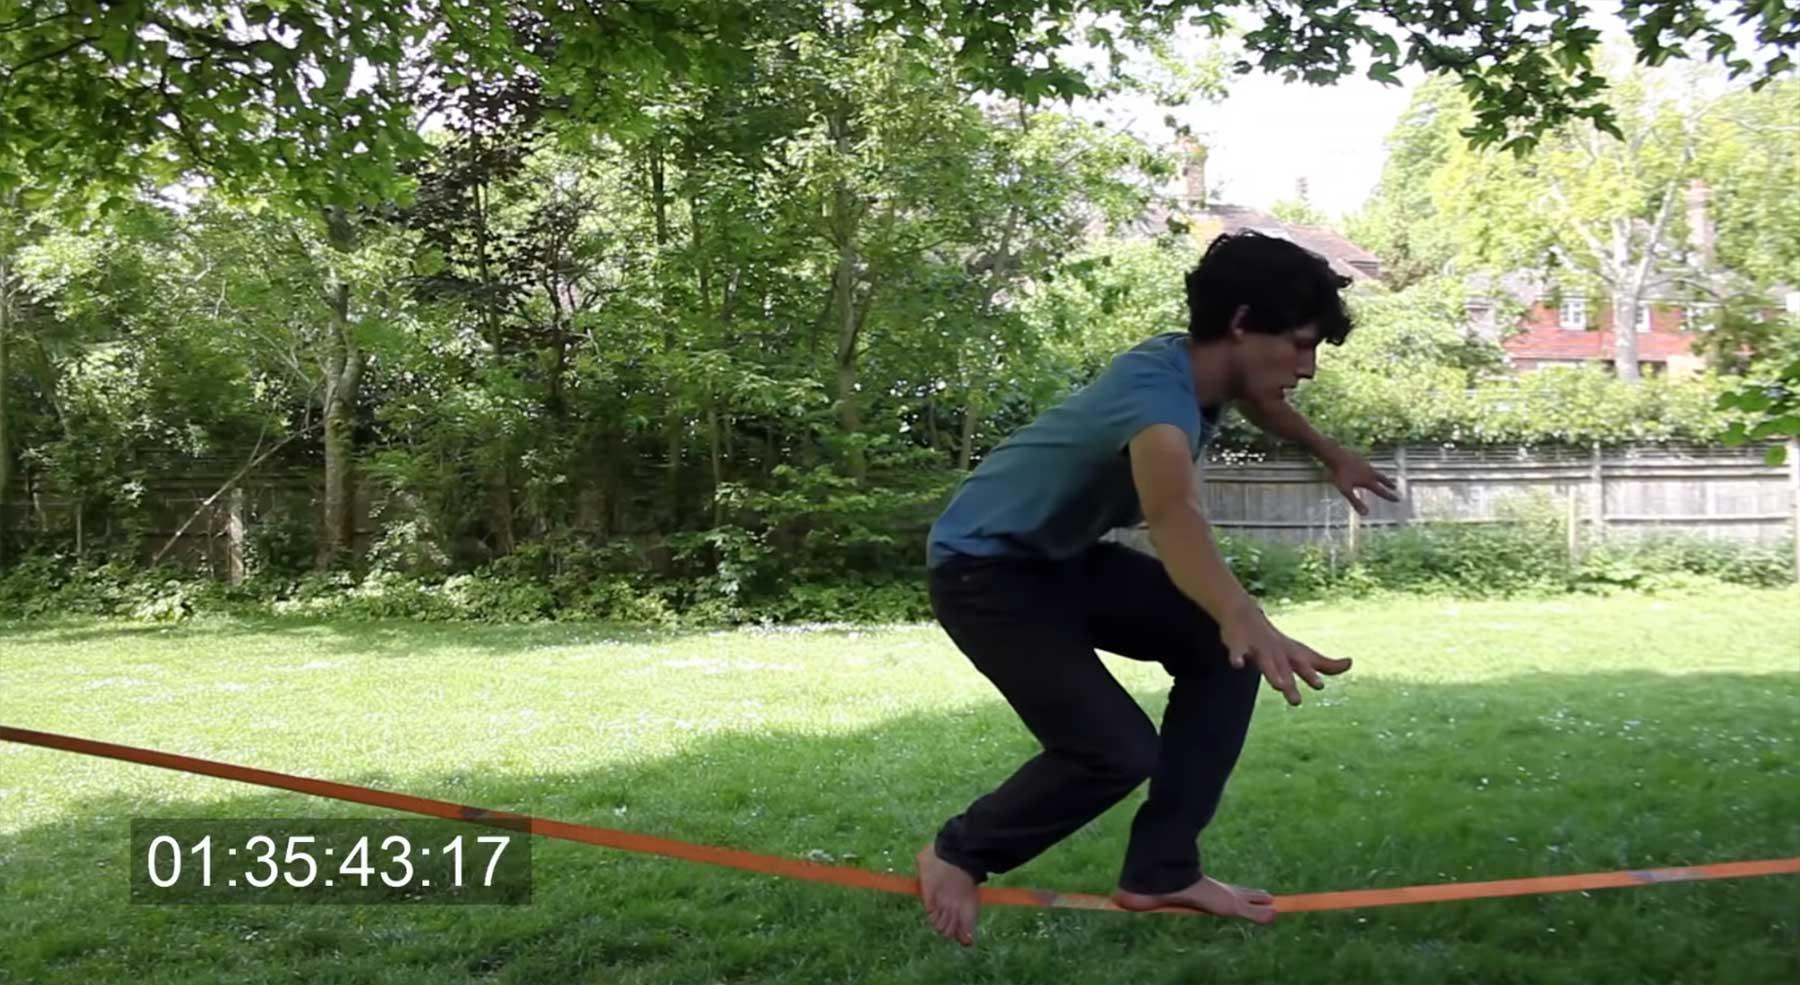 Owen Daughtery lernt Slackline learn-to-slackline